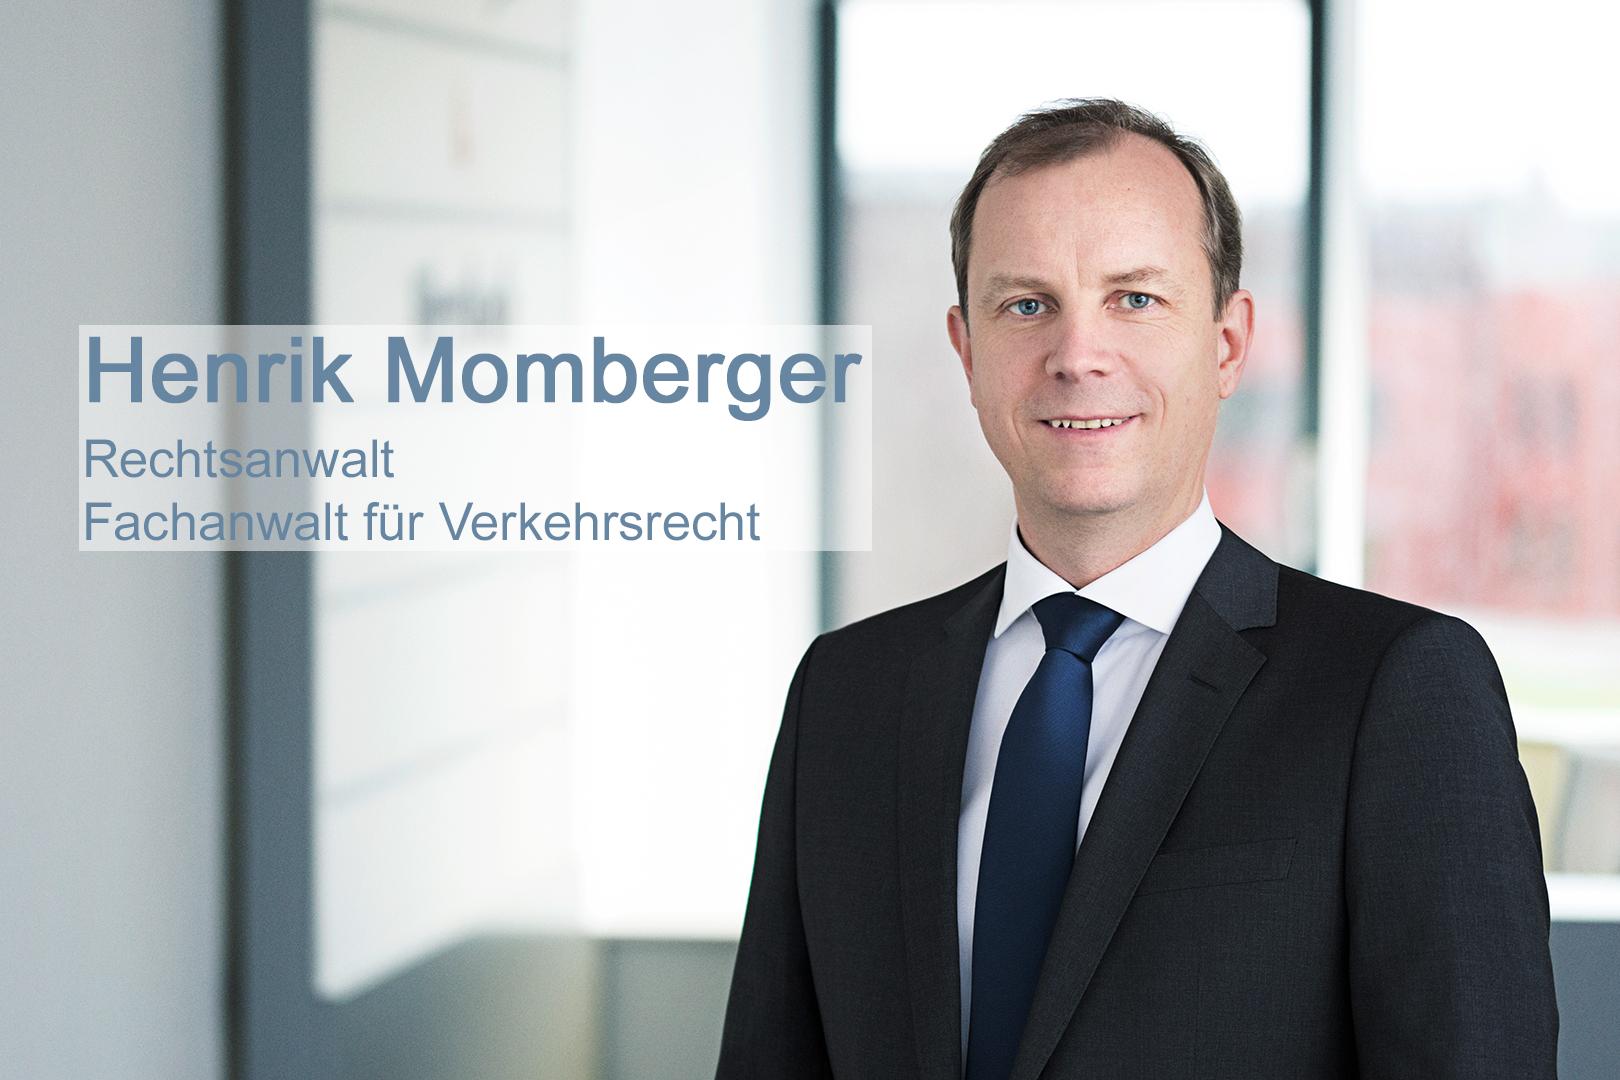 Adac Vertragsanwalt Henrik Momberger Rechtsanwalt Und Fachanwalt